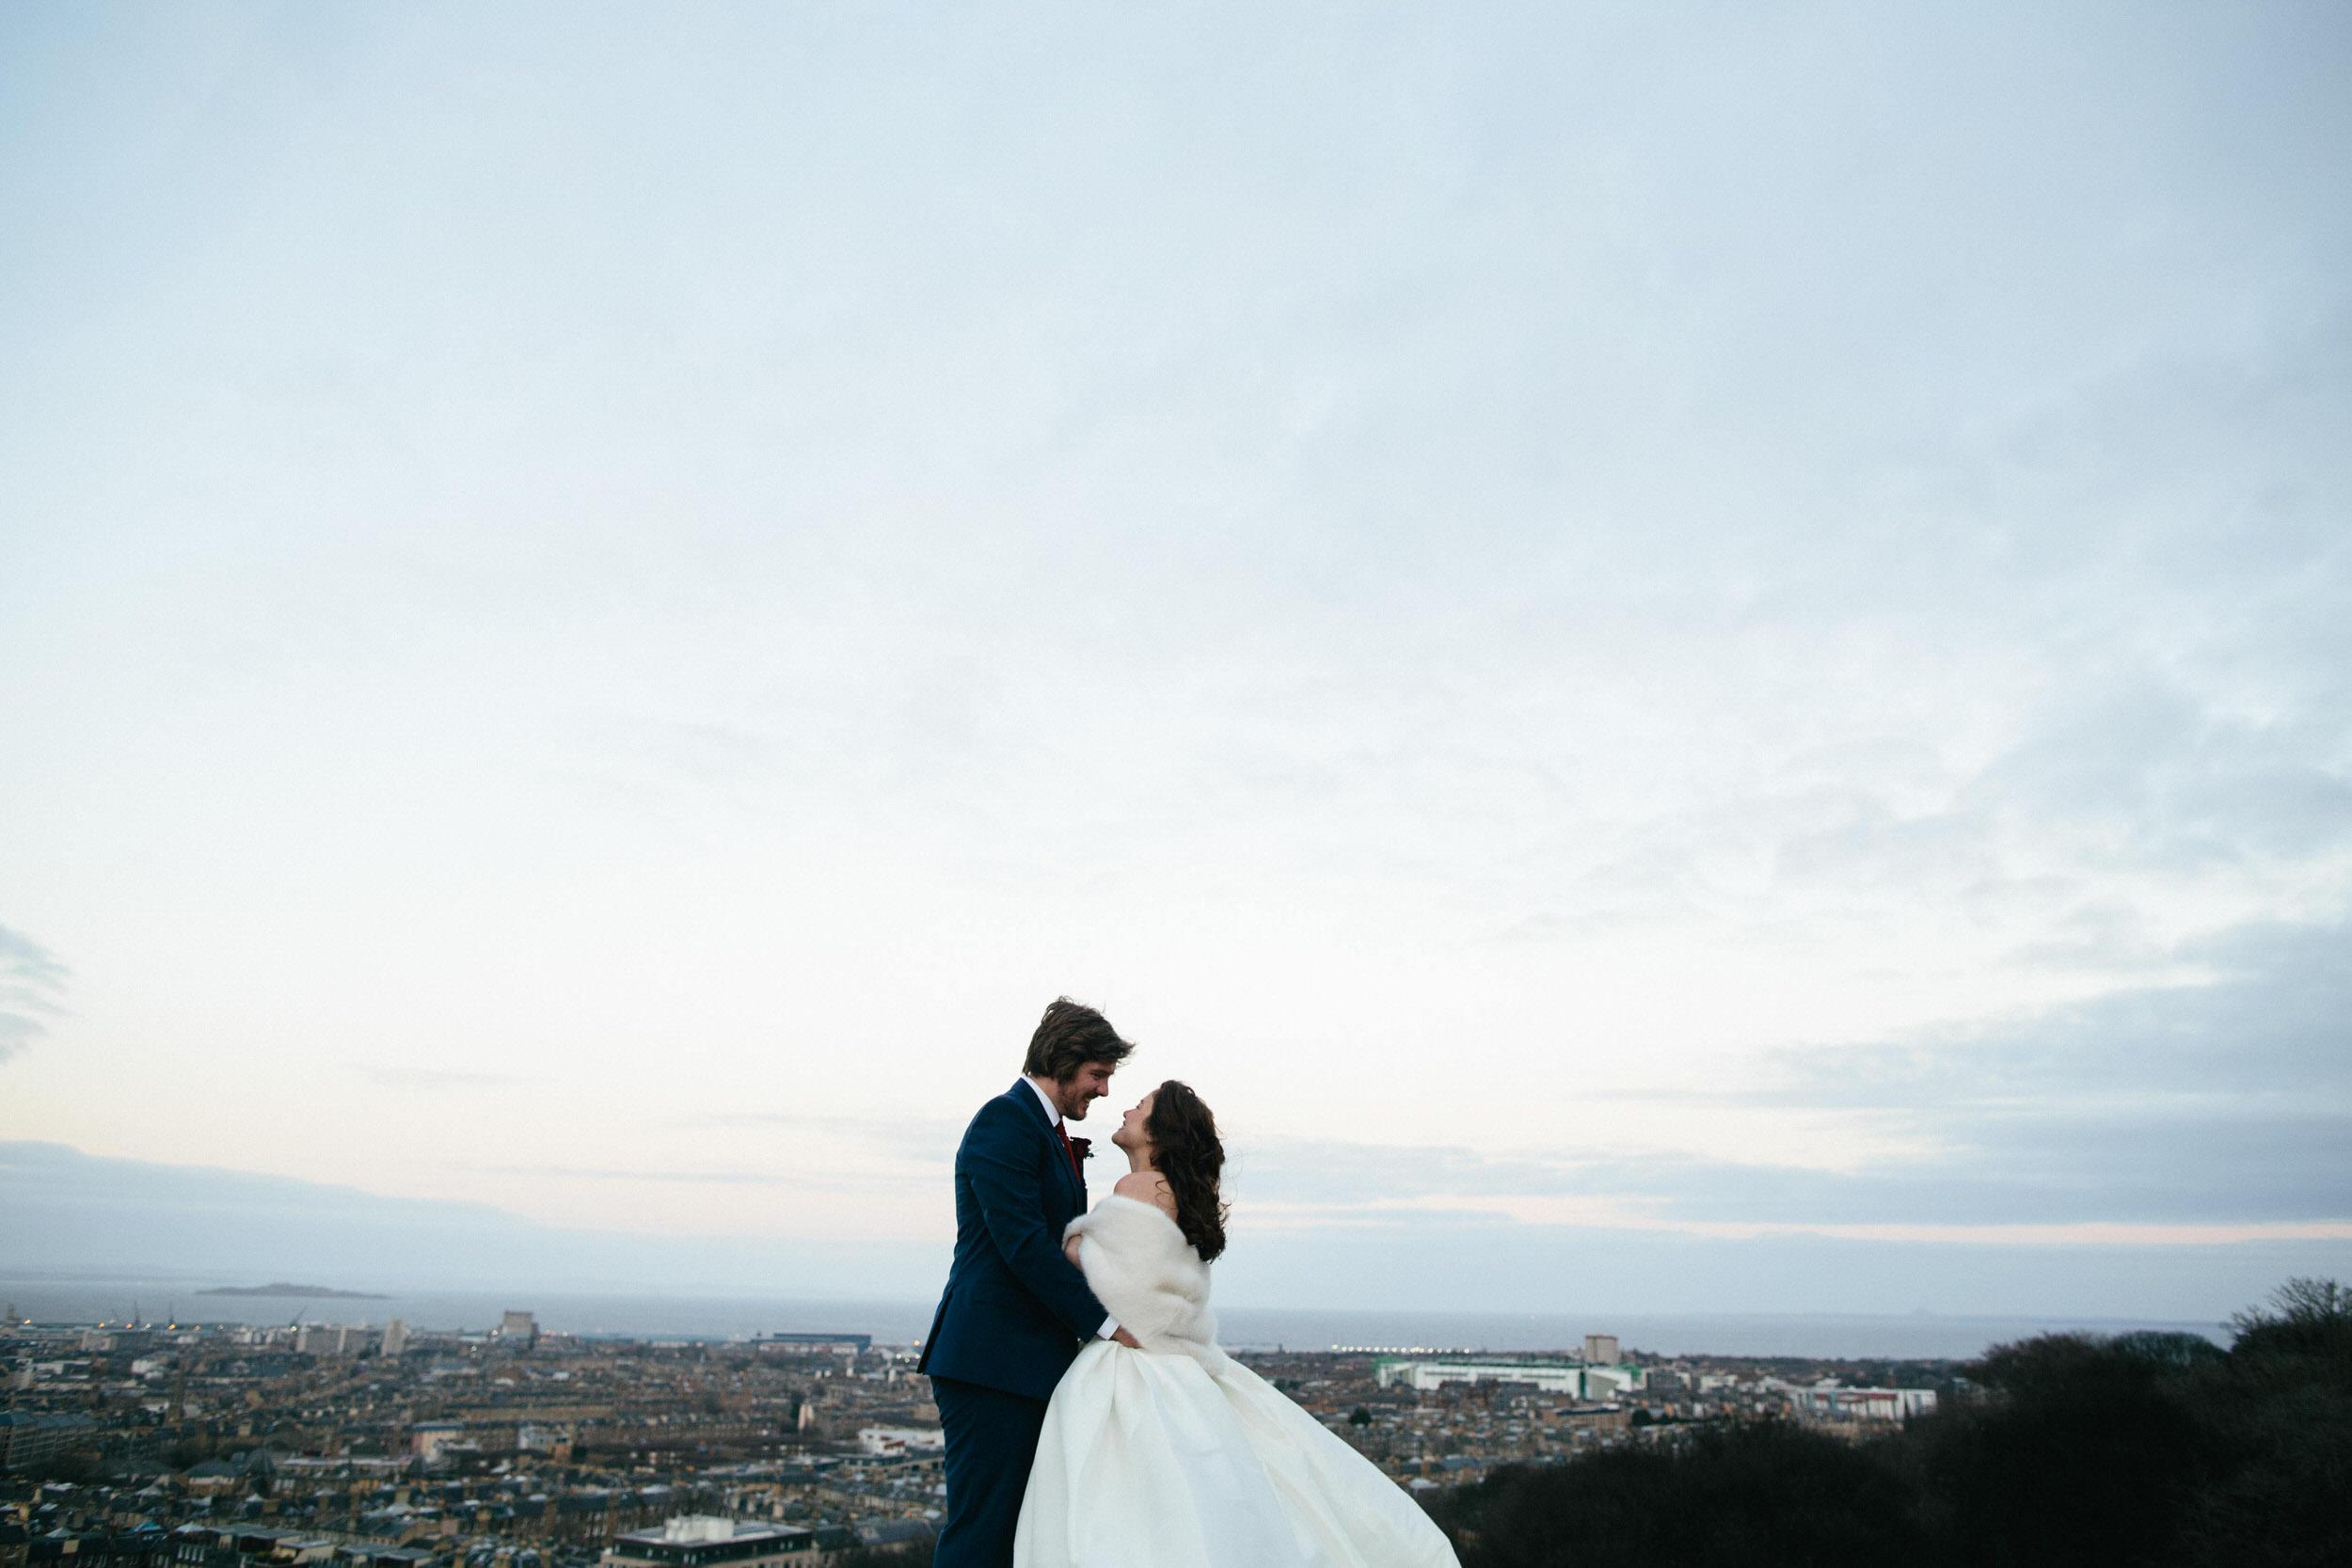 Quirky Wedding Photographer Scotland Glasgow Edinburgh Mirrorbox 144.jpg